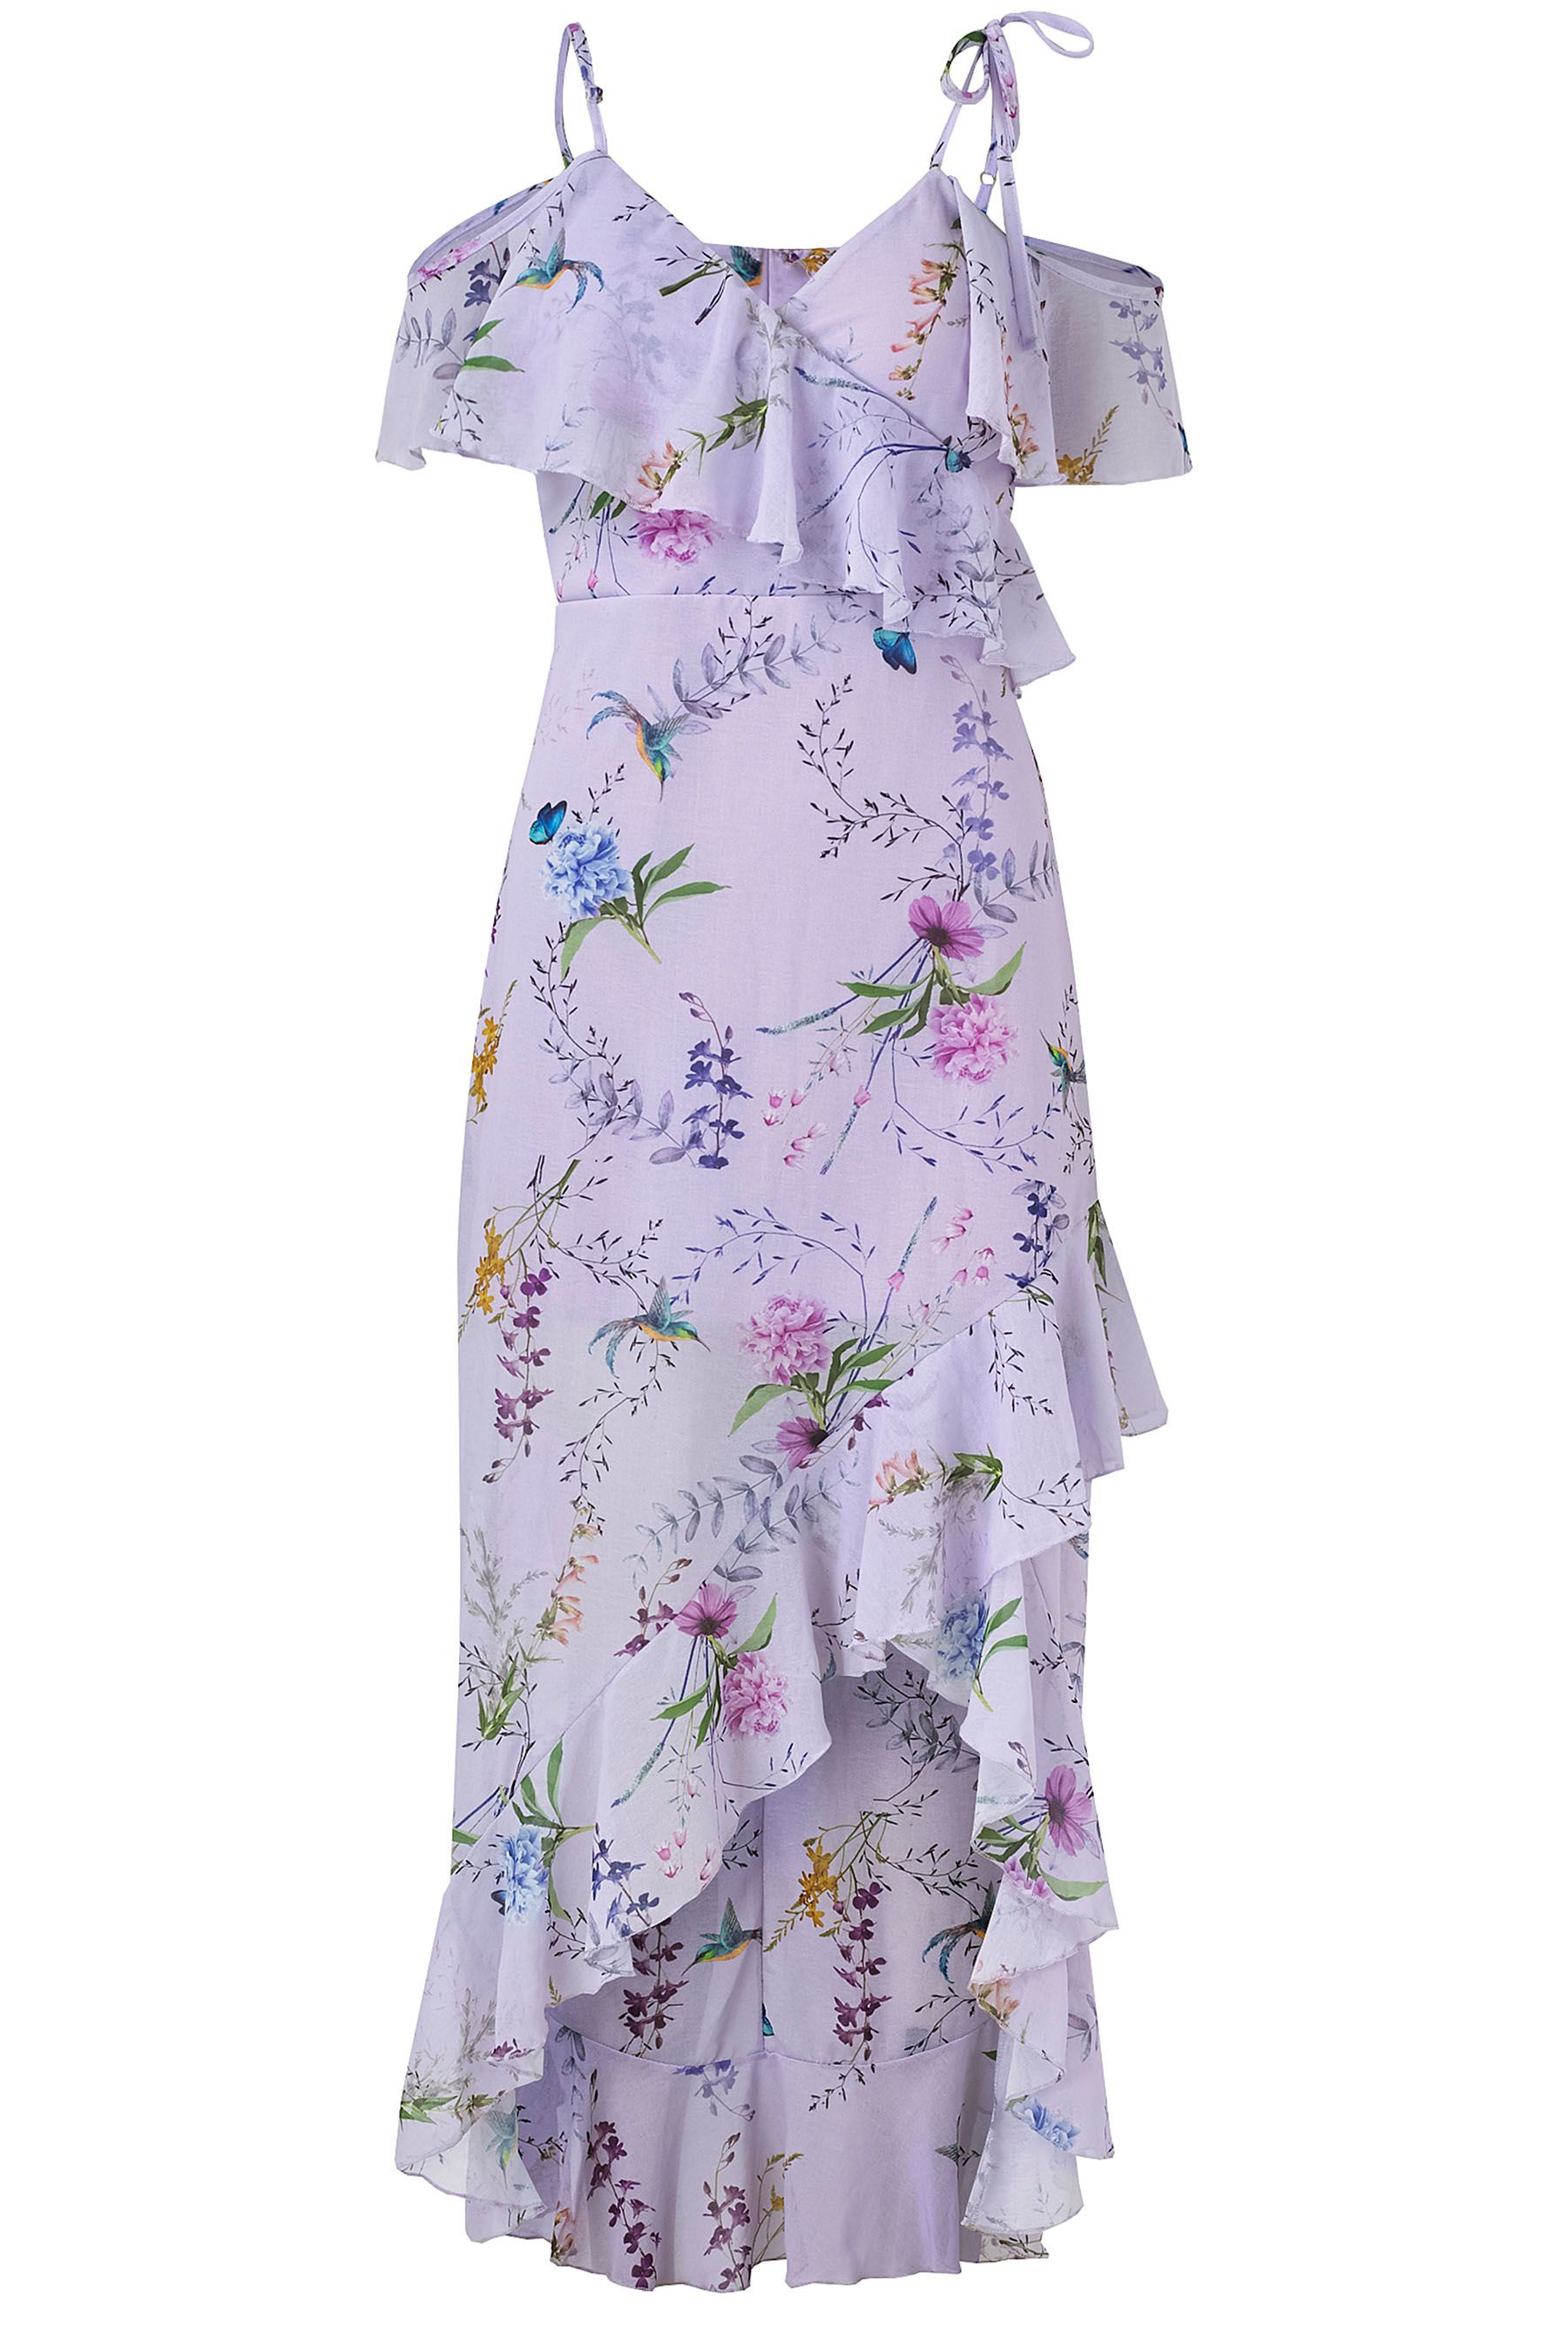 568d347a58580 Womens Sistaglam Loves Jessica Floral Print Frill Maxi Dress - Purple